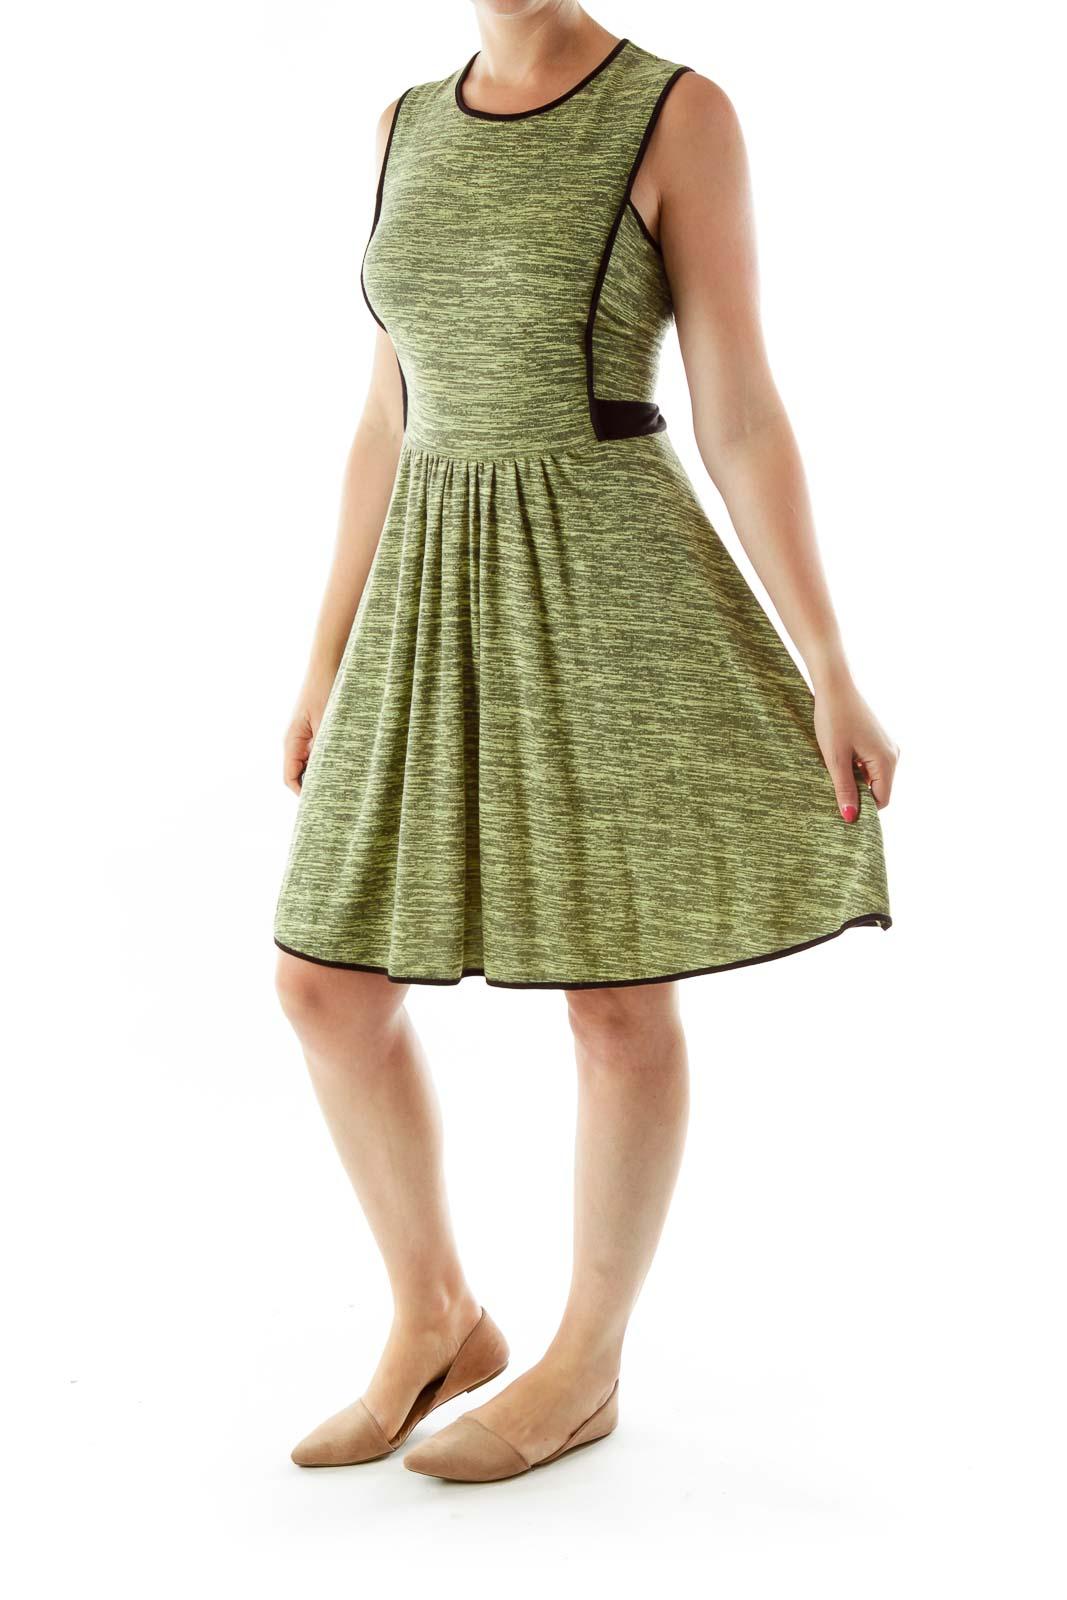 Green Sleeveless Work Dress